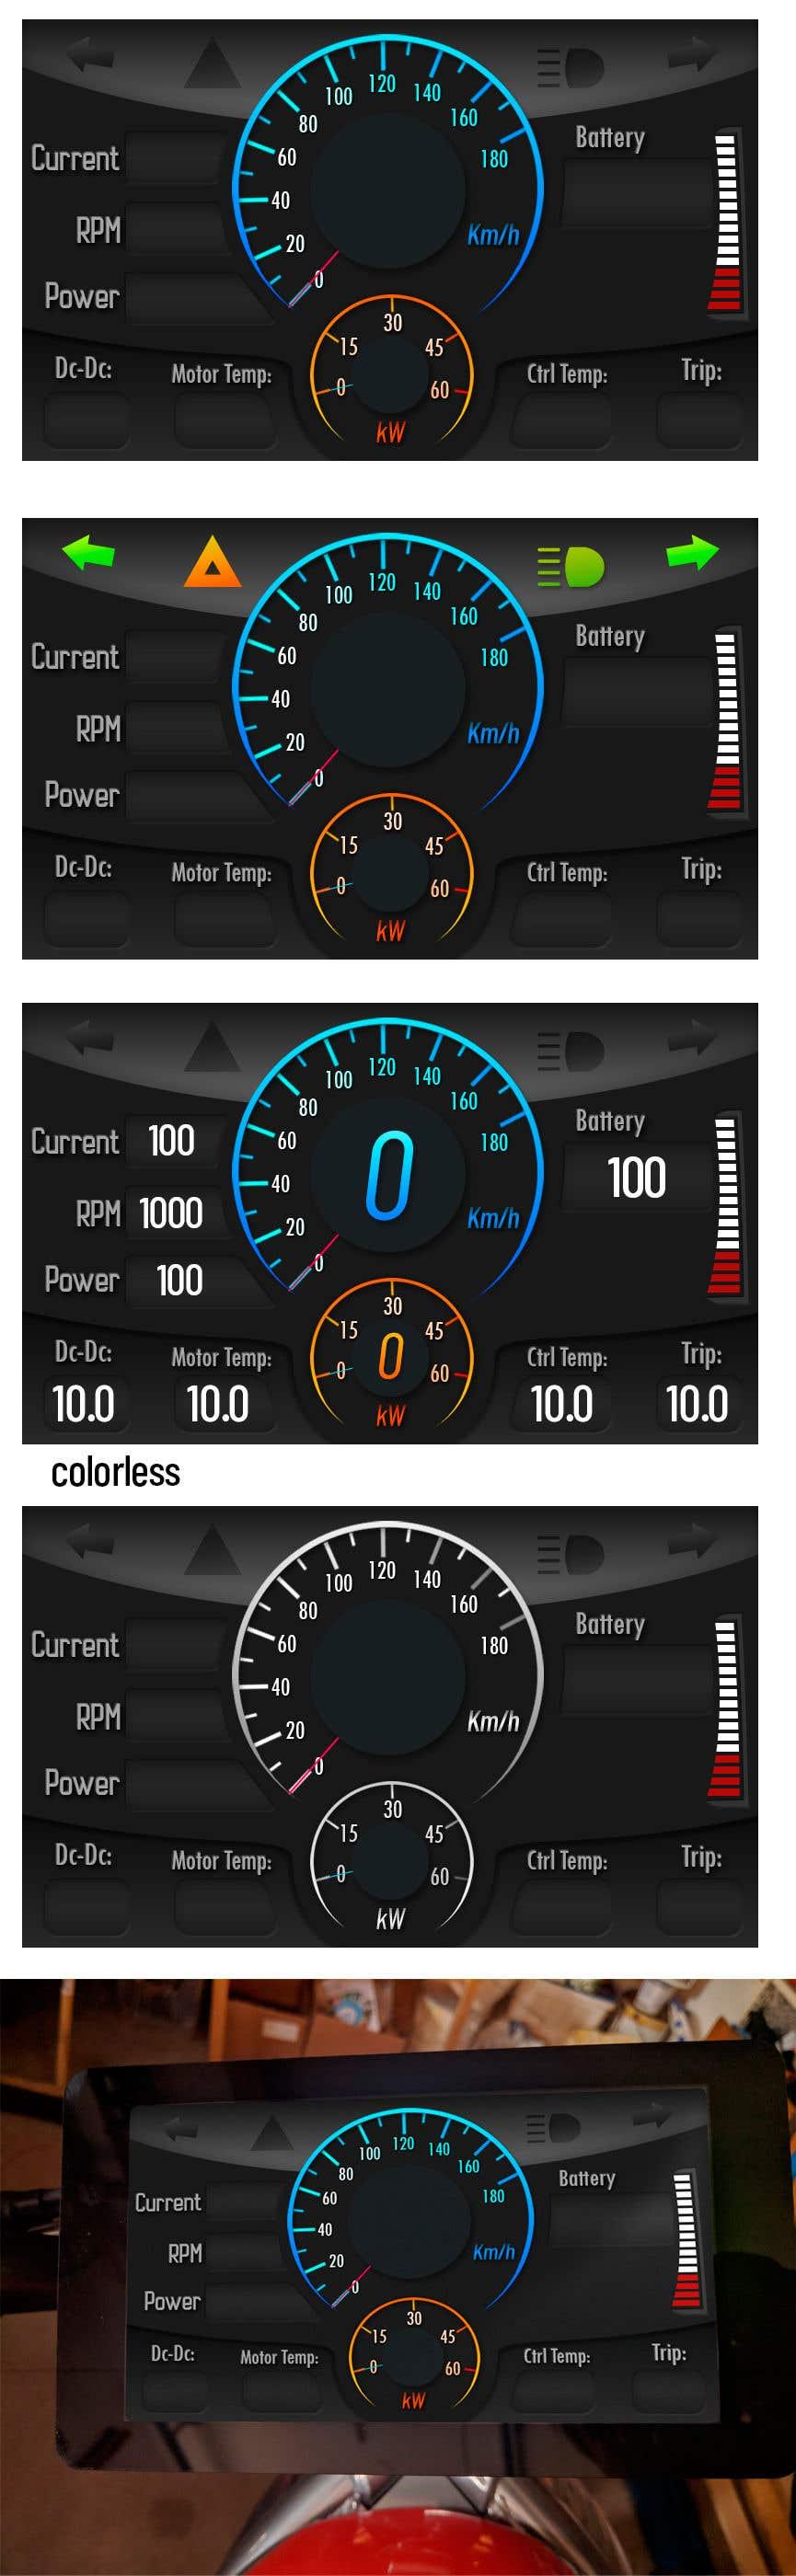 Bài tham dự cuộc thi #26 cho Graphic for motorcycle dashboard